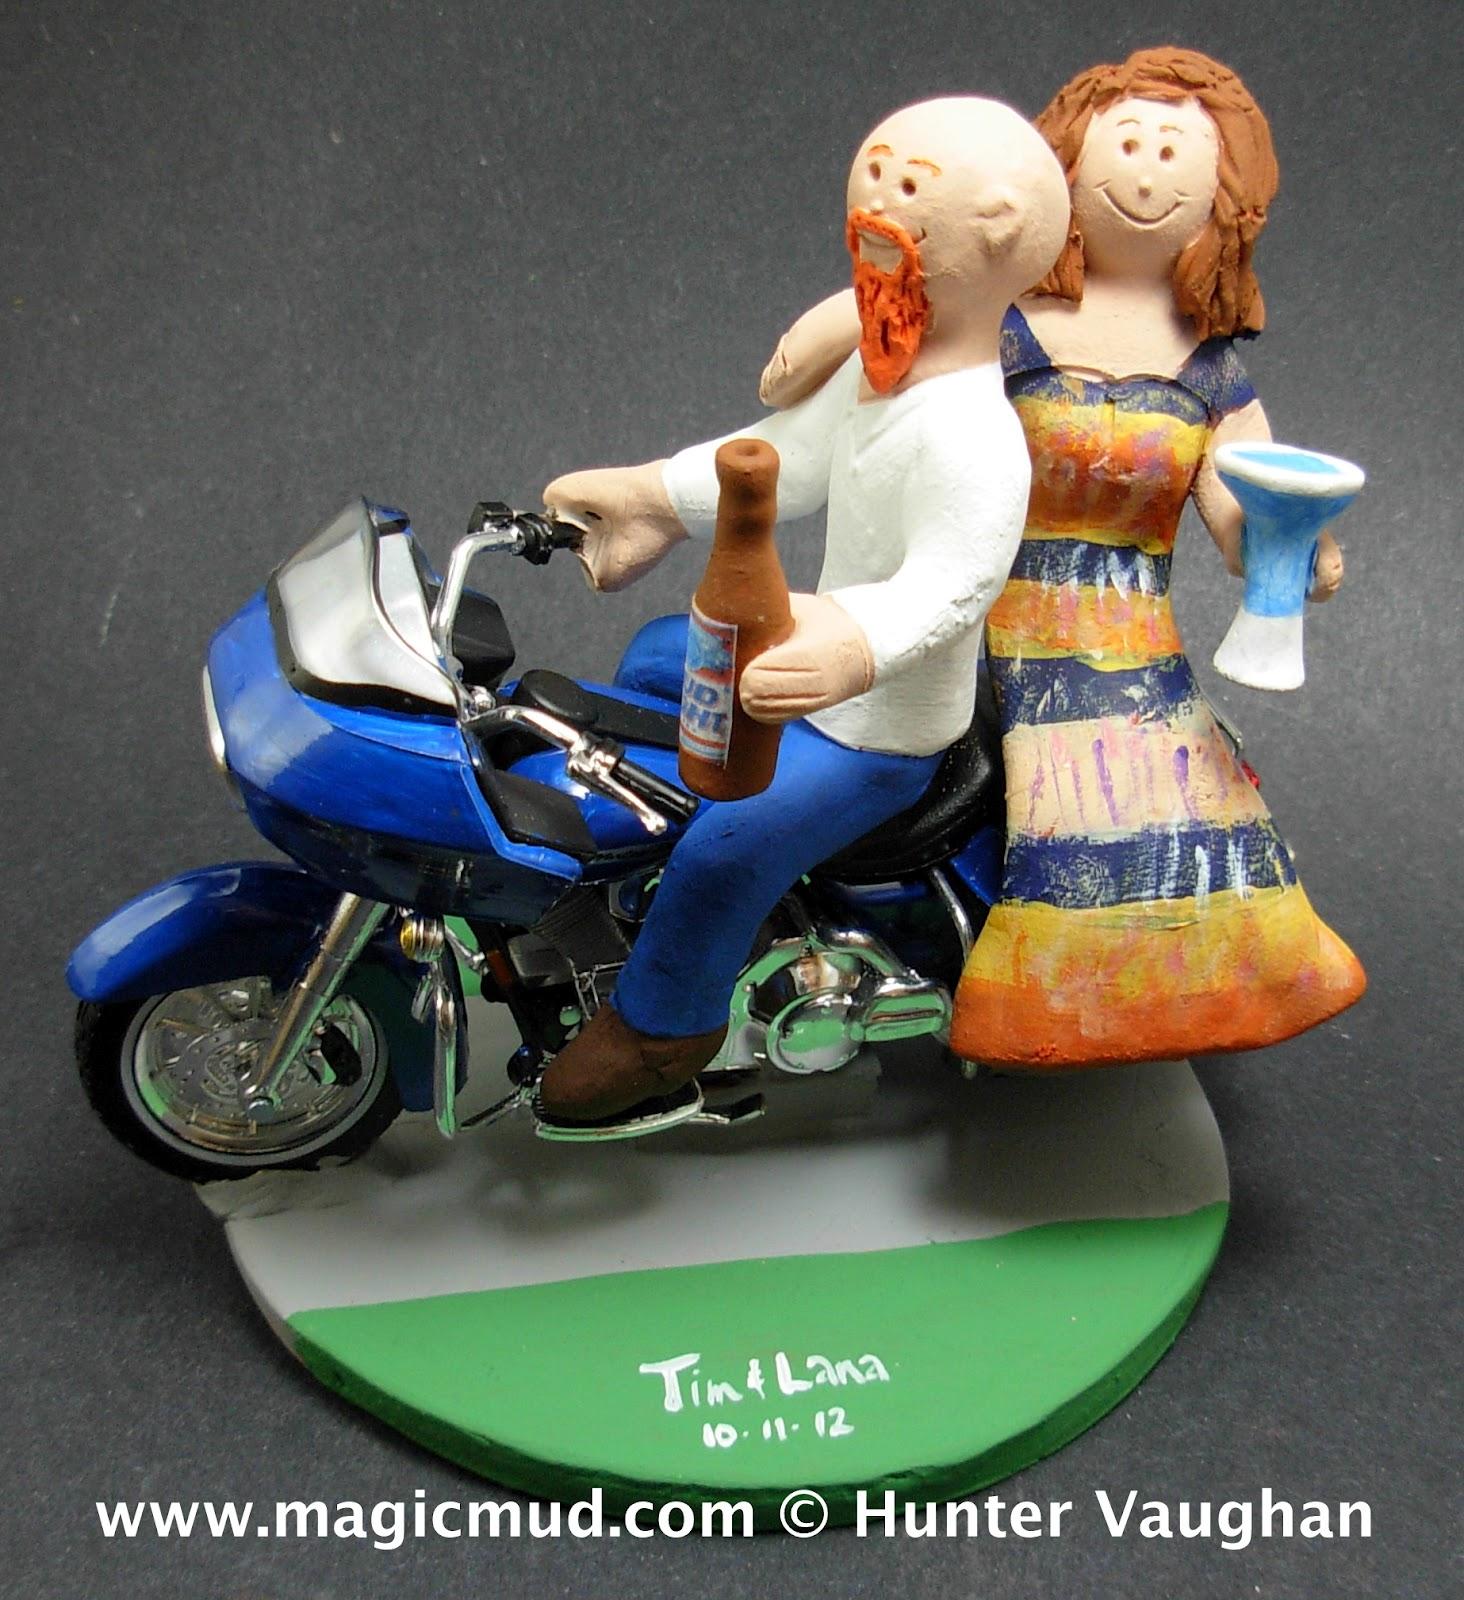 Wedding Cake Toppers Bald Groom Goatee Top Beautiful Bride Bike Motorcycle Wedding Cake Topper Ride Home Furniture Diy Tallergrafico Com Uy